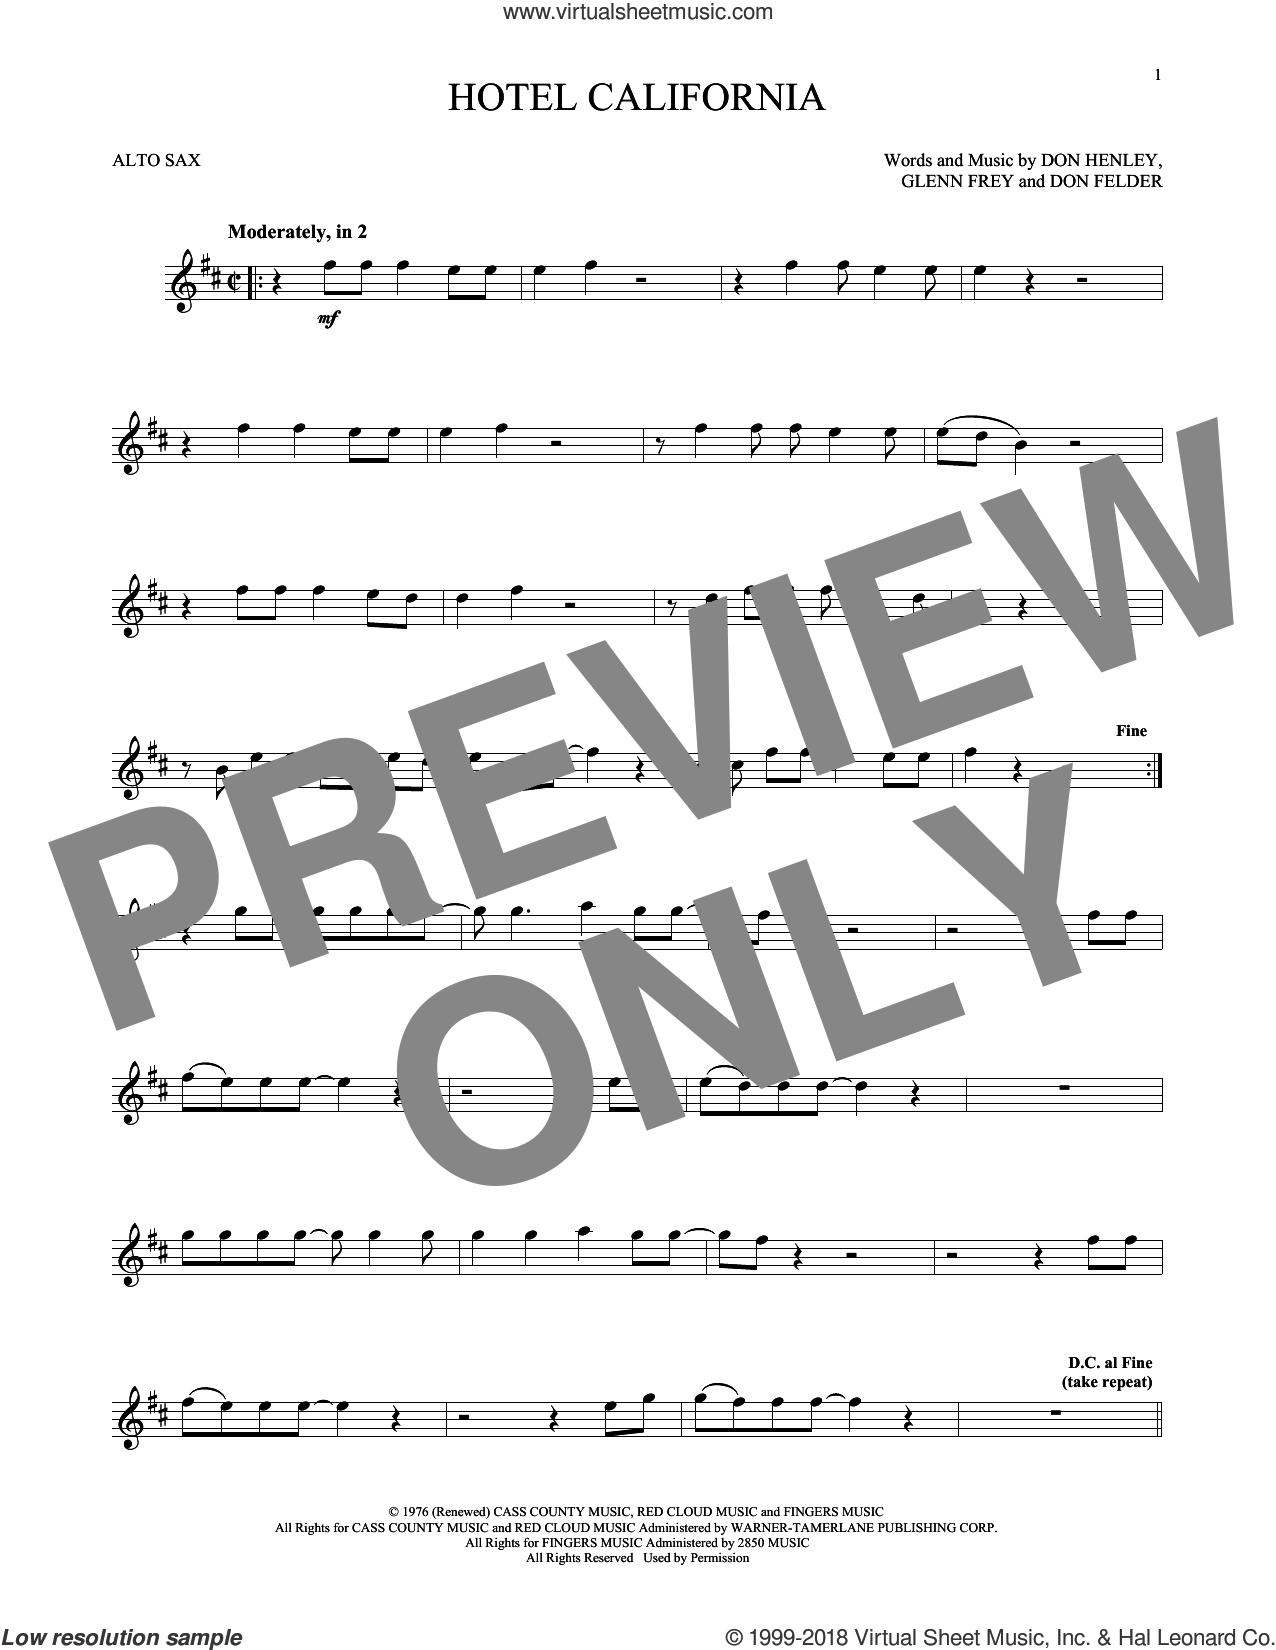 Hotel California sheet music for alto saxophone solo by Don Henley, The Eagles, Don Felder and Glenn Frey, intermediate skill level